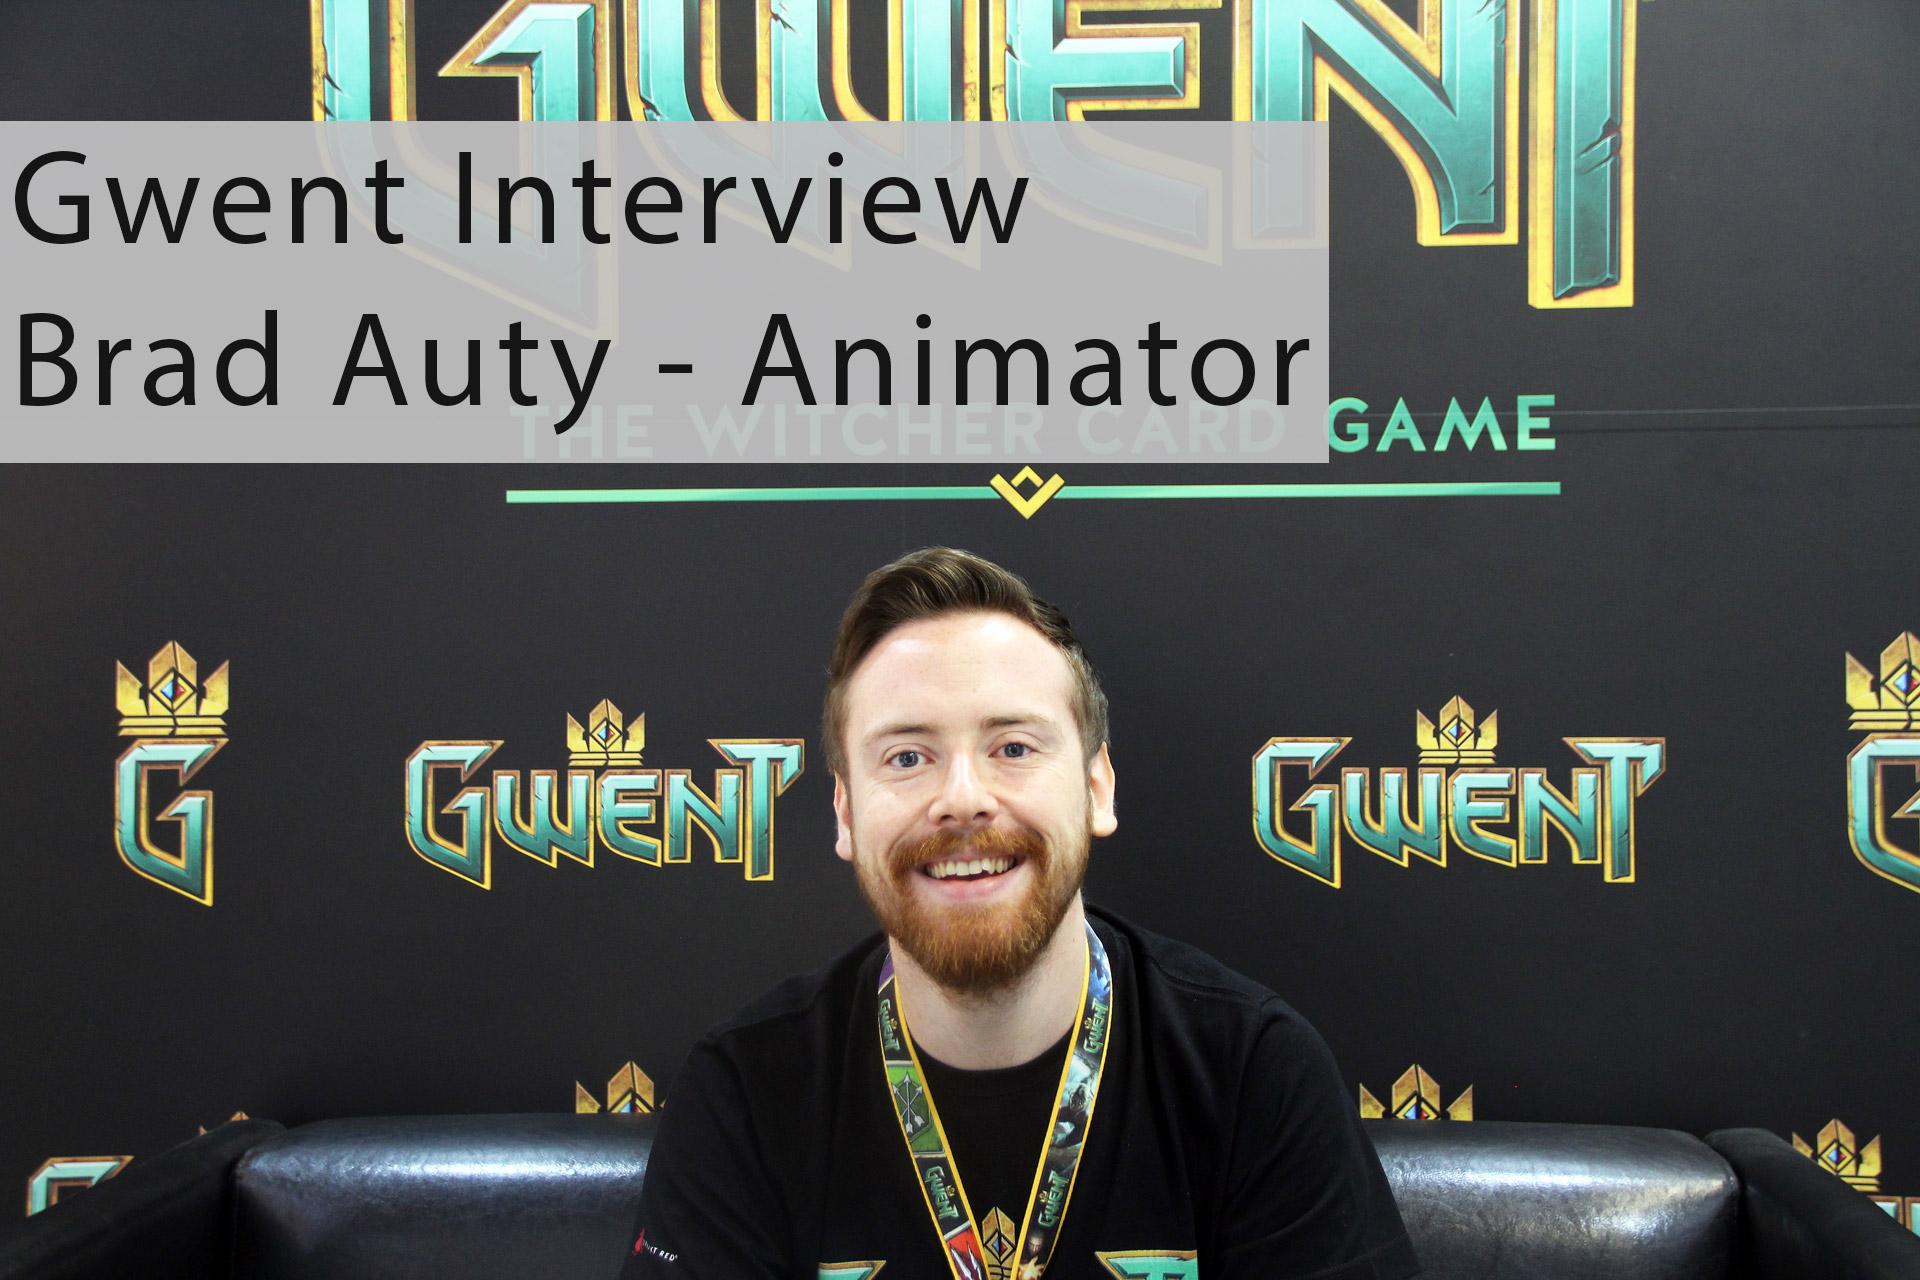 Gwent Interview - Brad Auty über Closed Beta uvm.